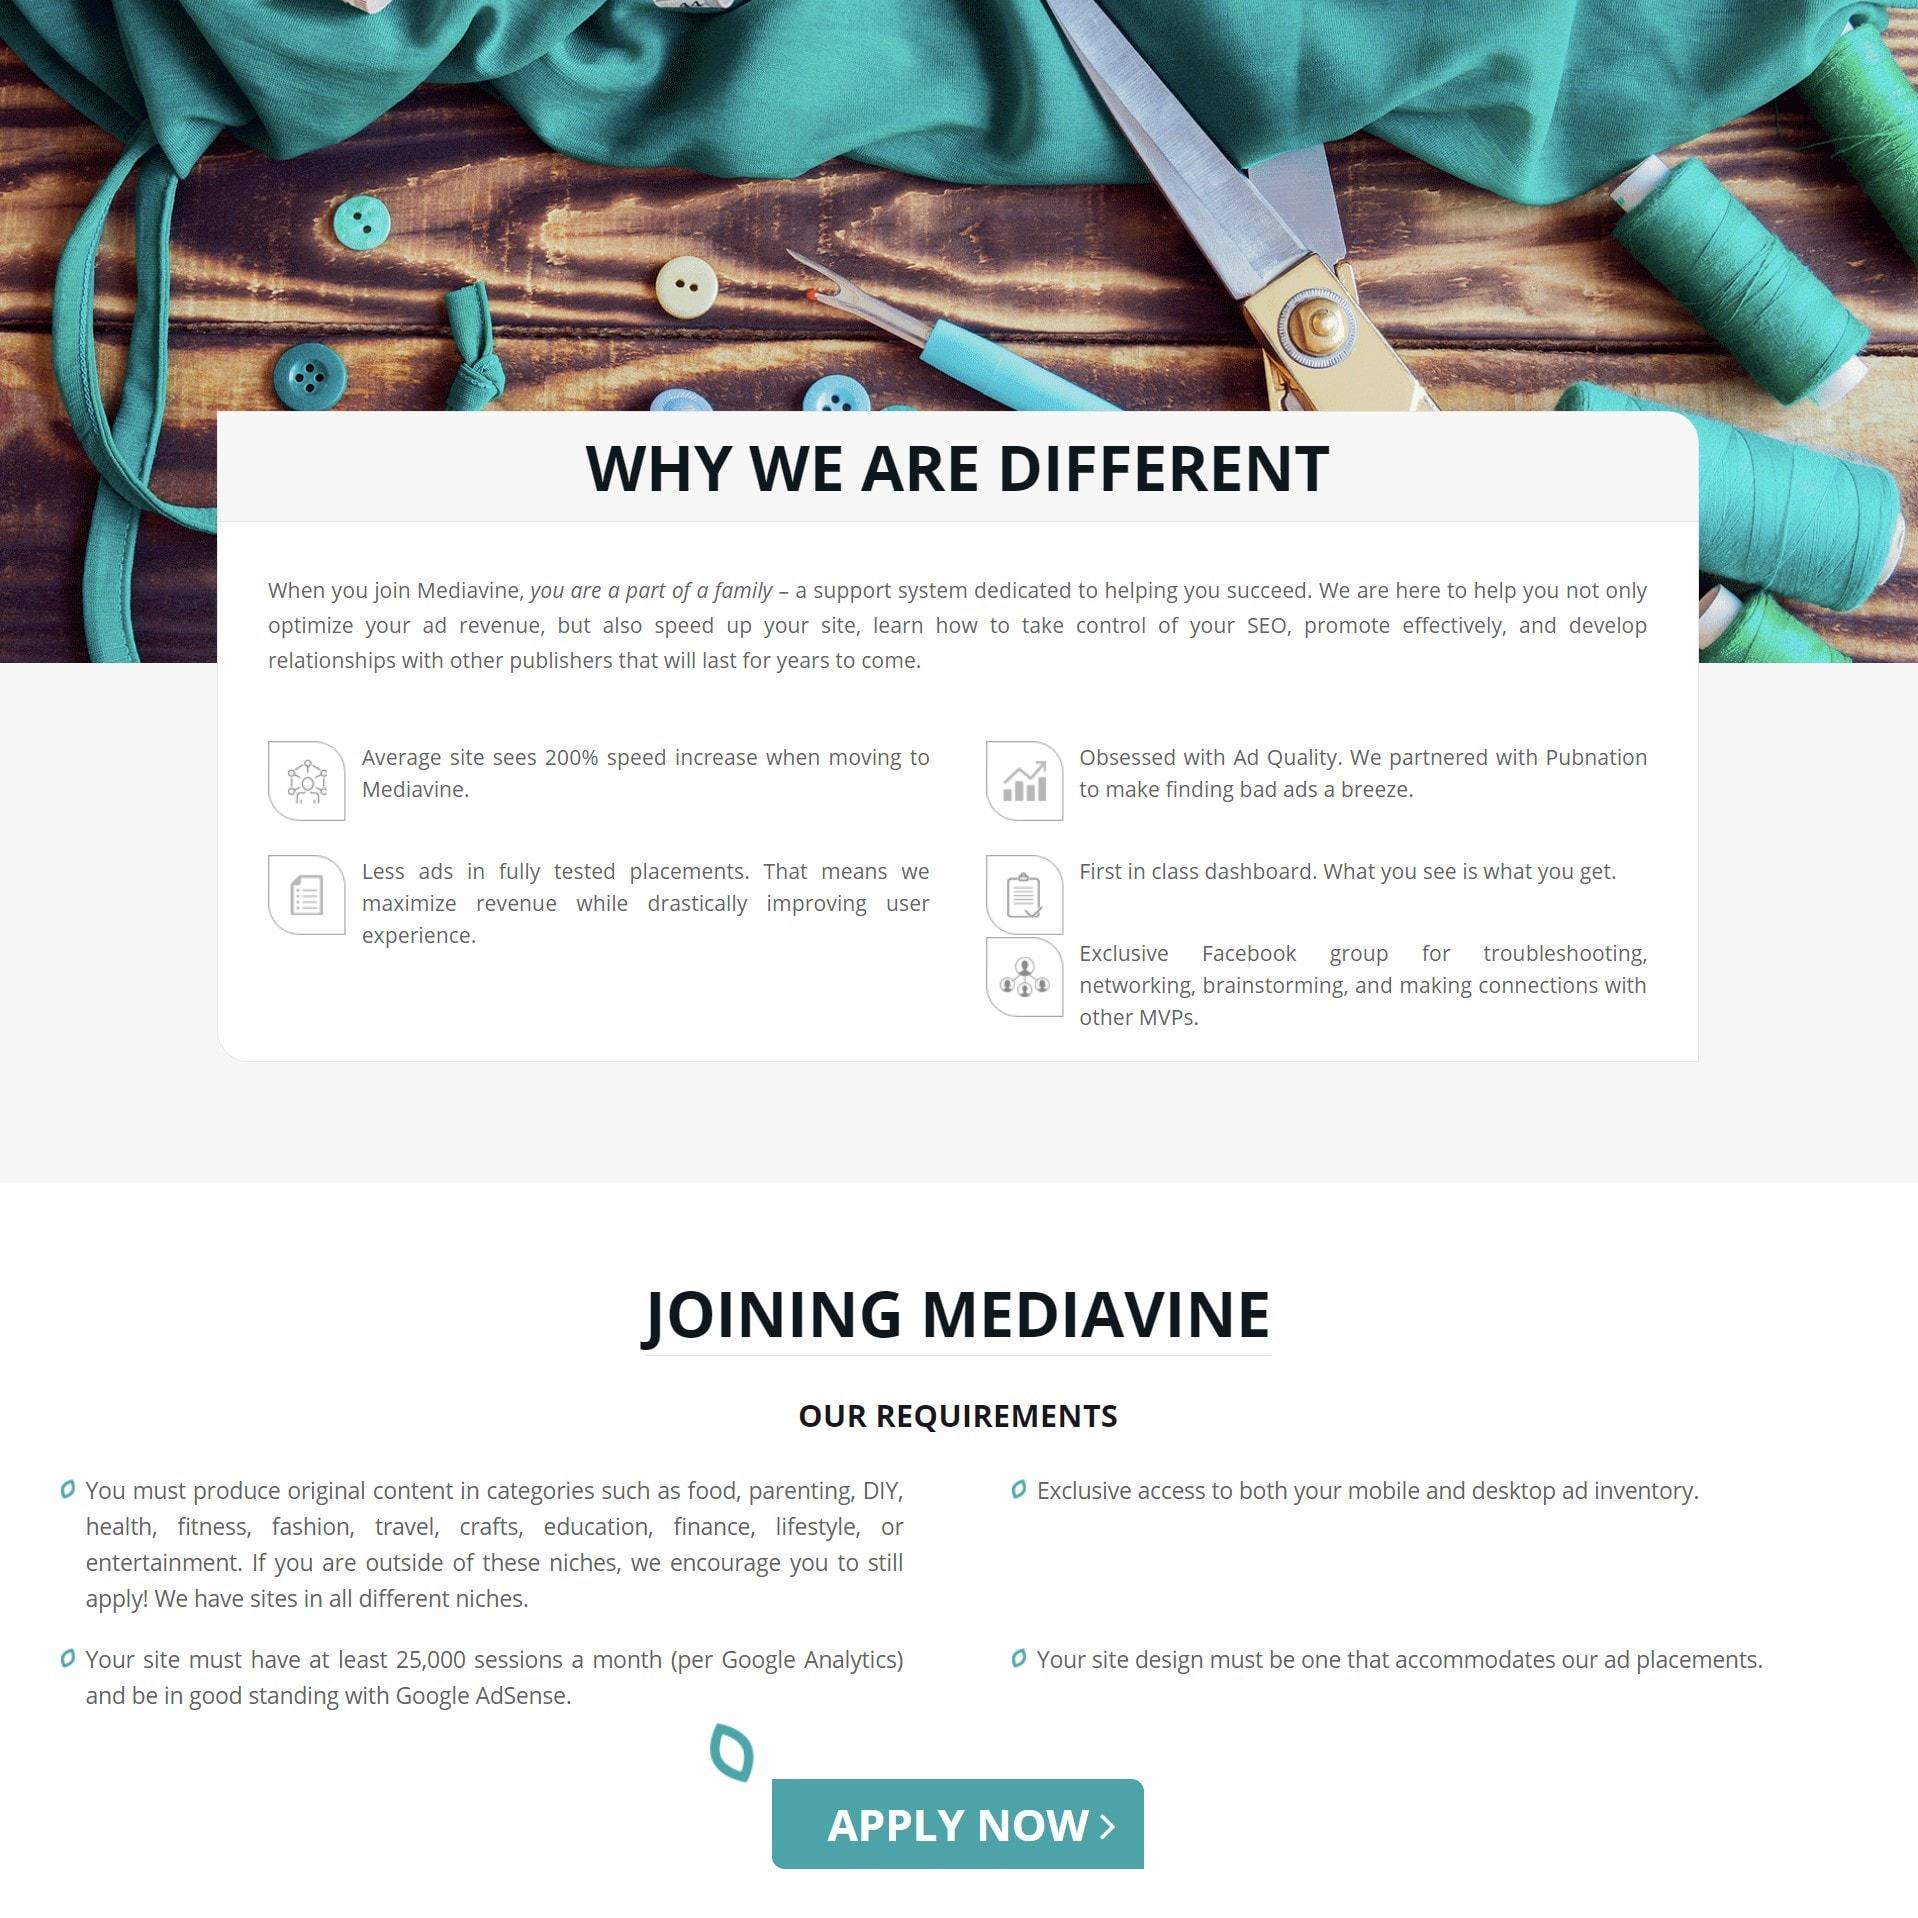 screengrab of Mediavine's application criteria